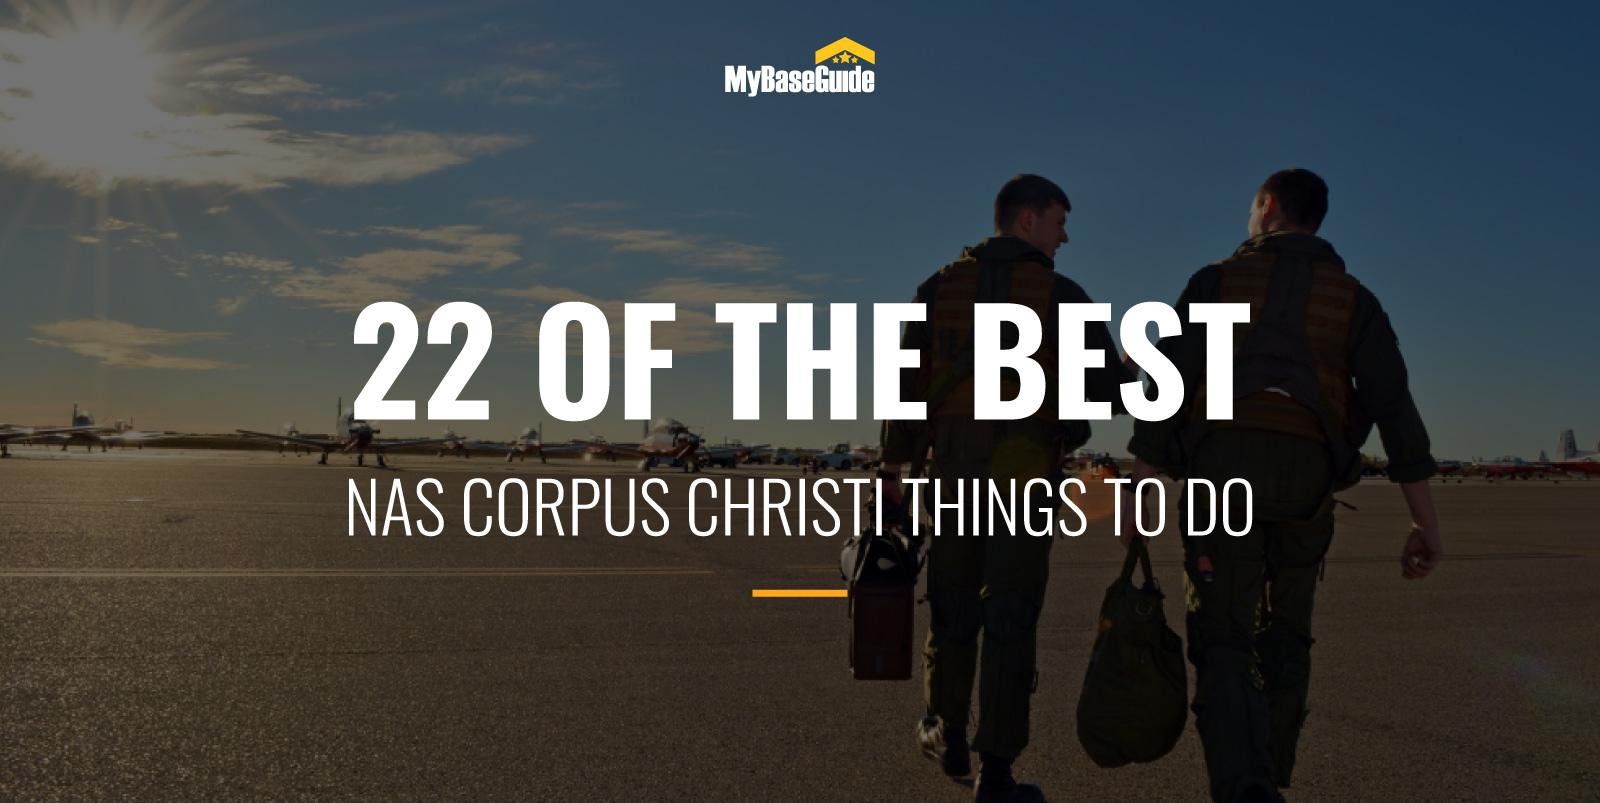 22 Of the Best Things to Do Near NAS Corpus Christi